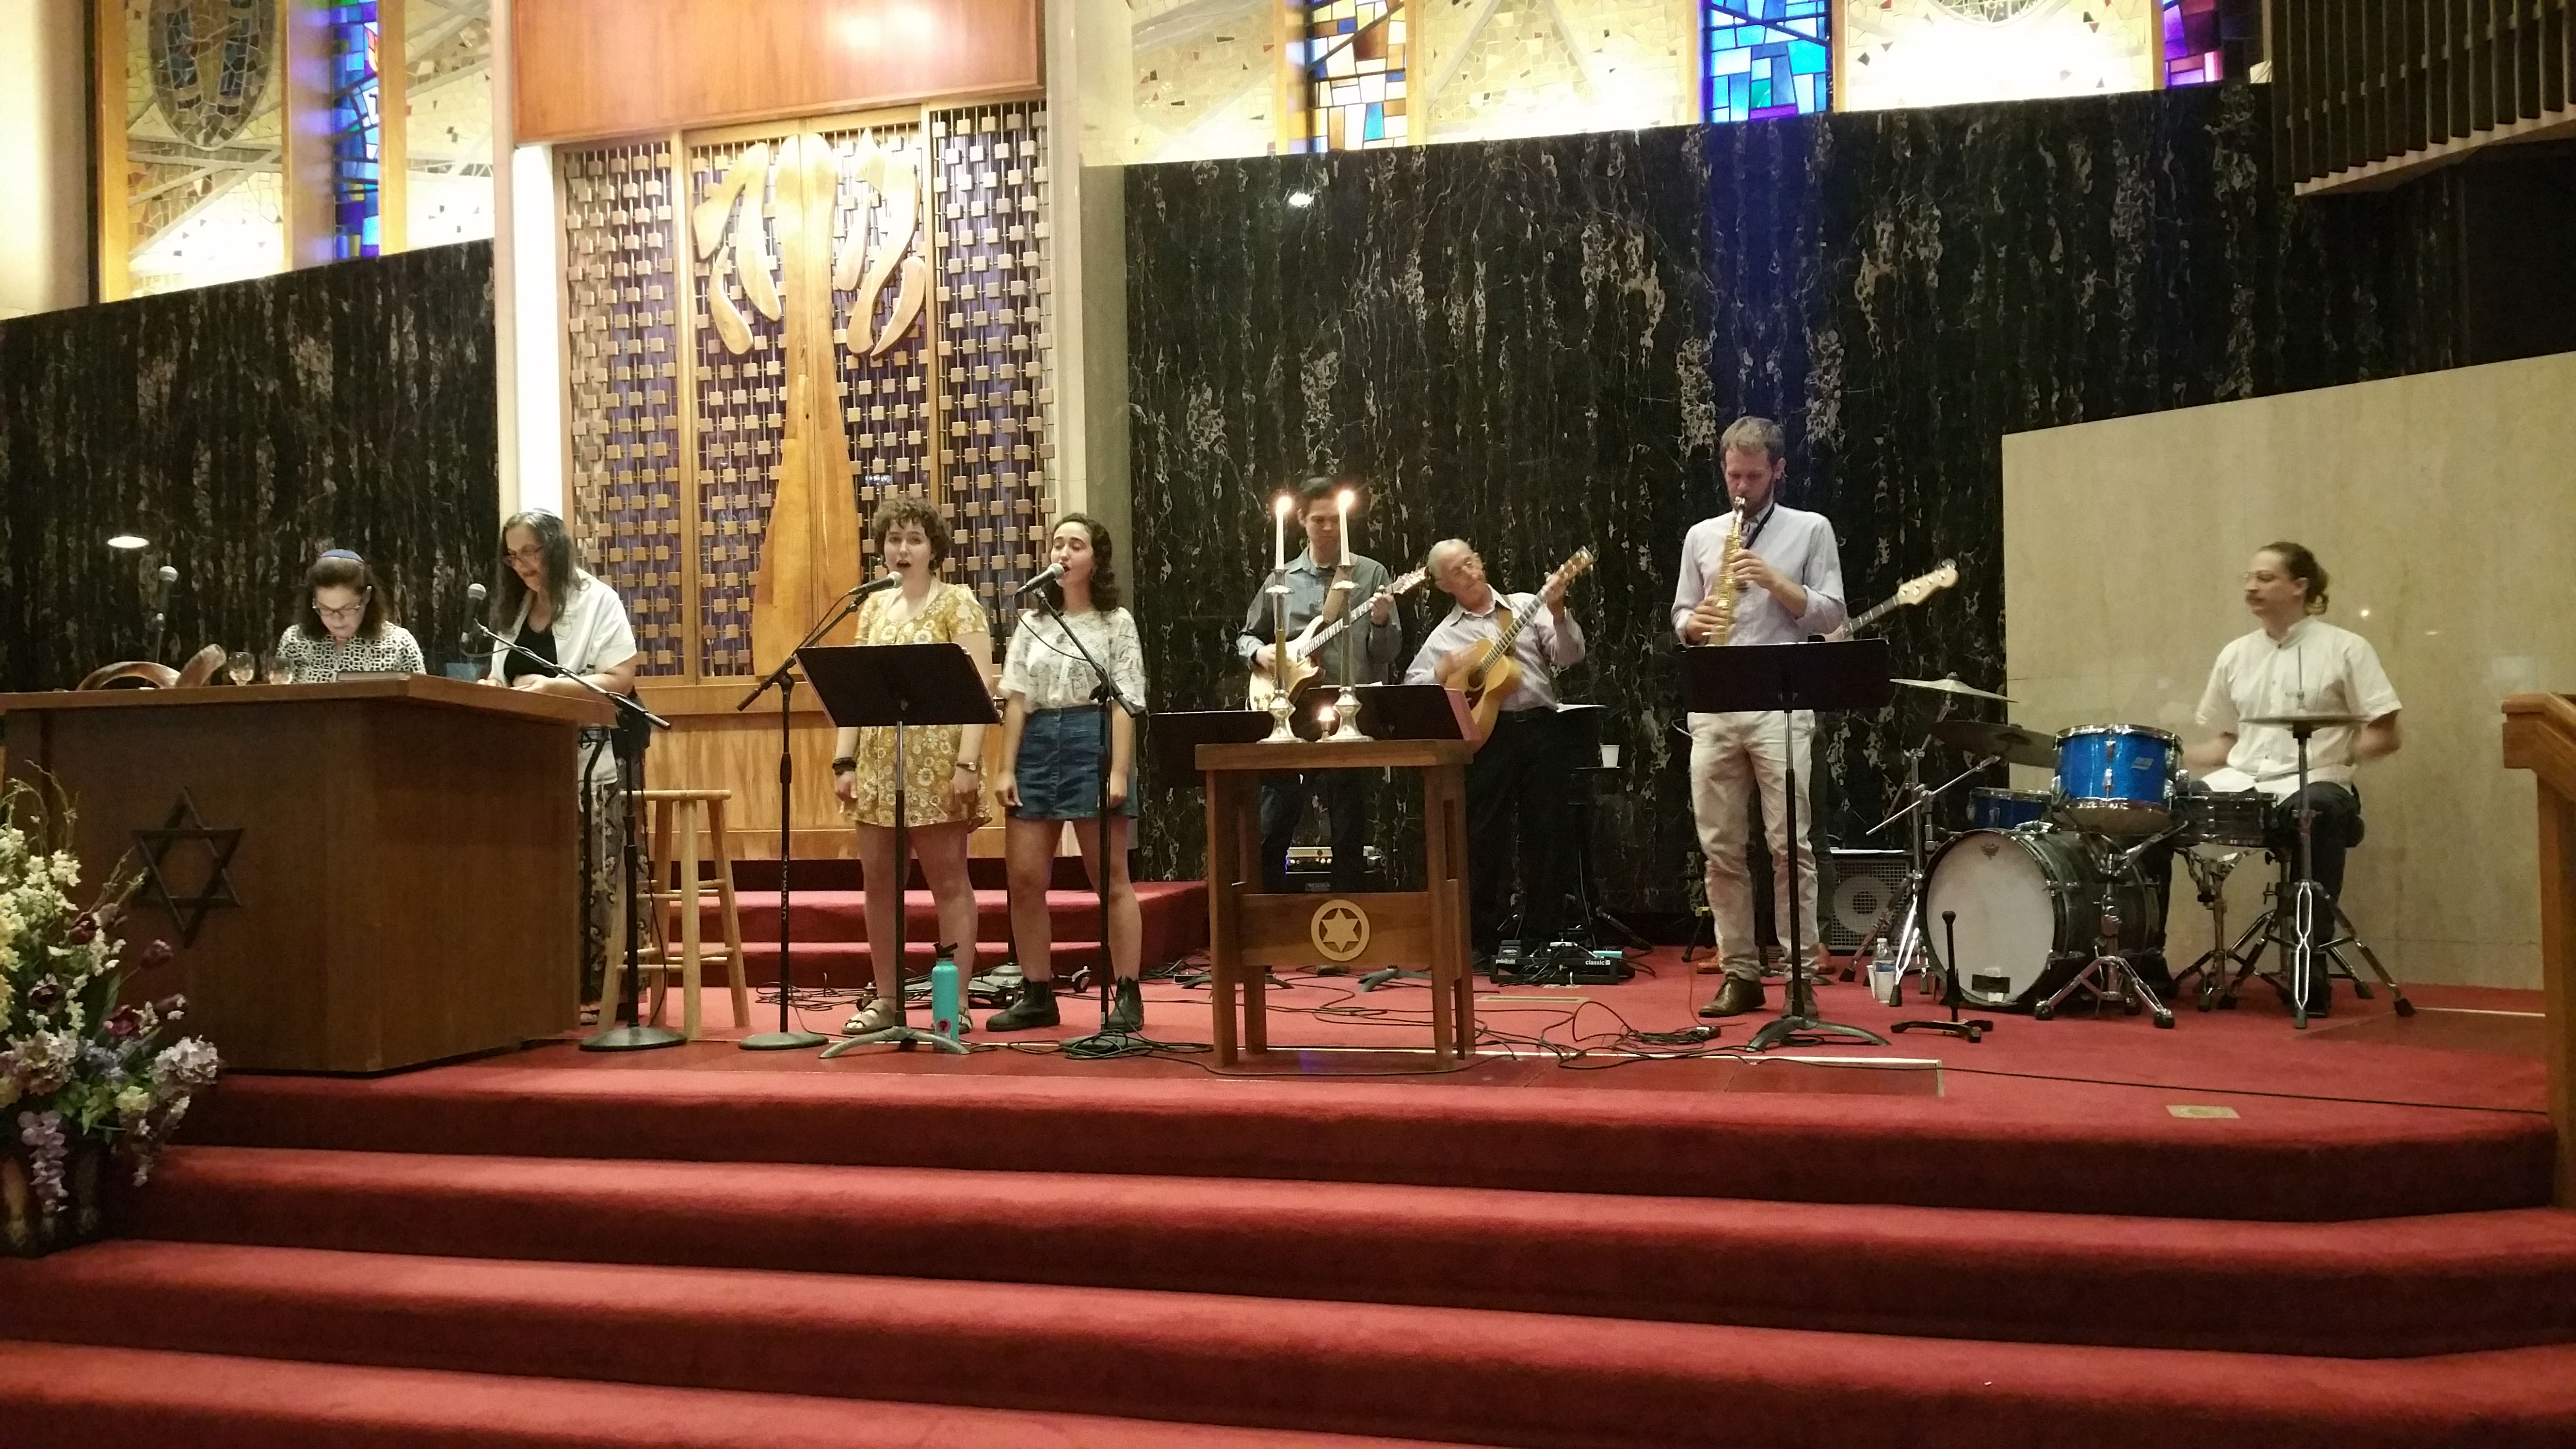 Seeking Shabbat Rocks! Service and Family Shabbat Dinner